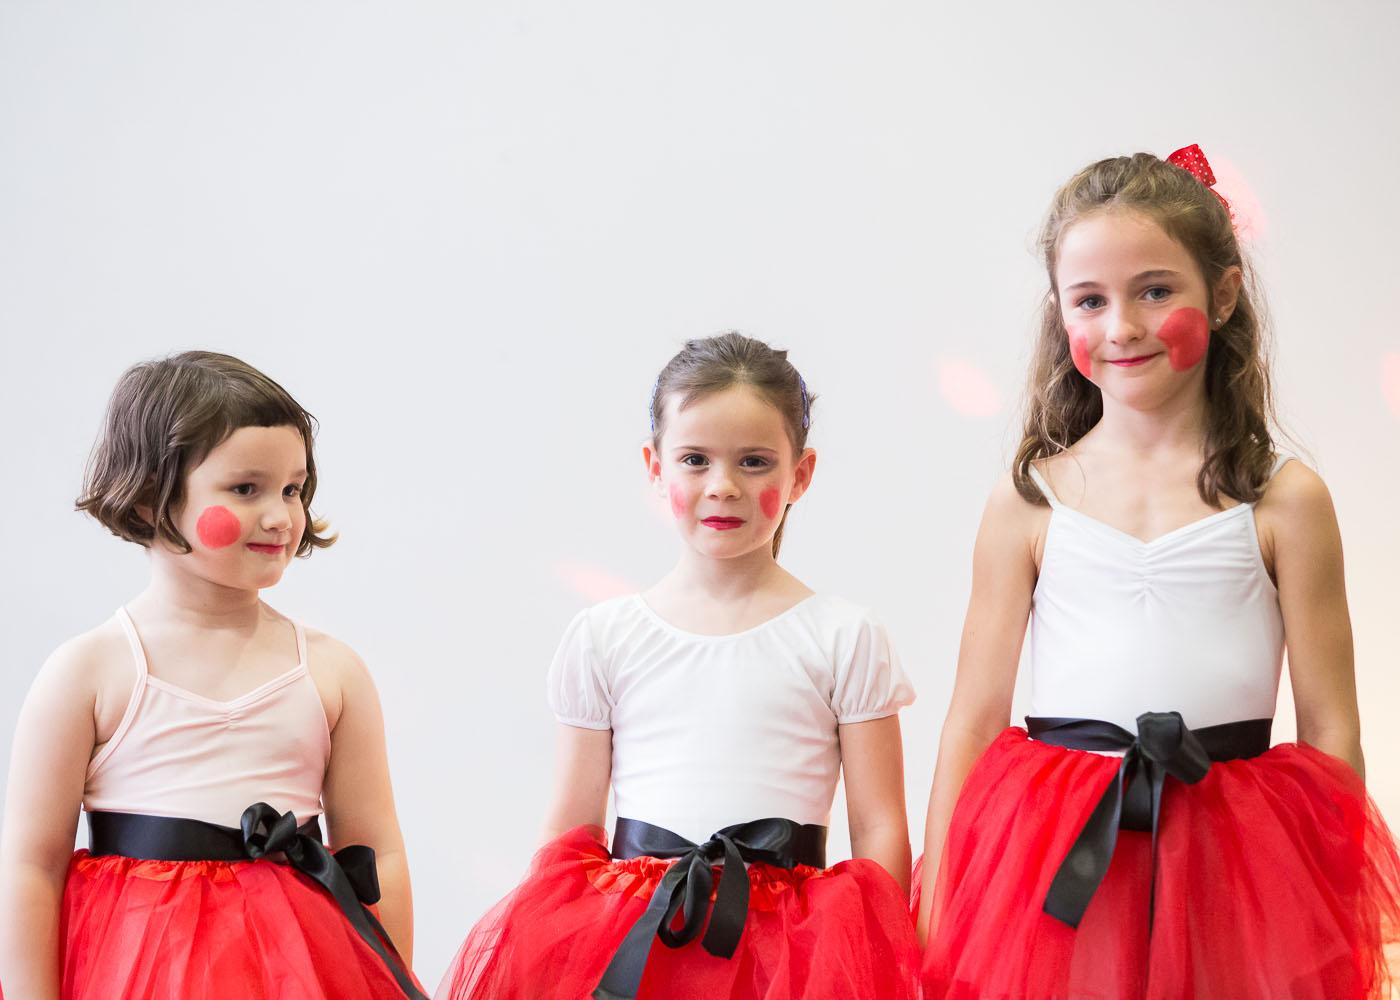 Tres futuras bailarinas